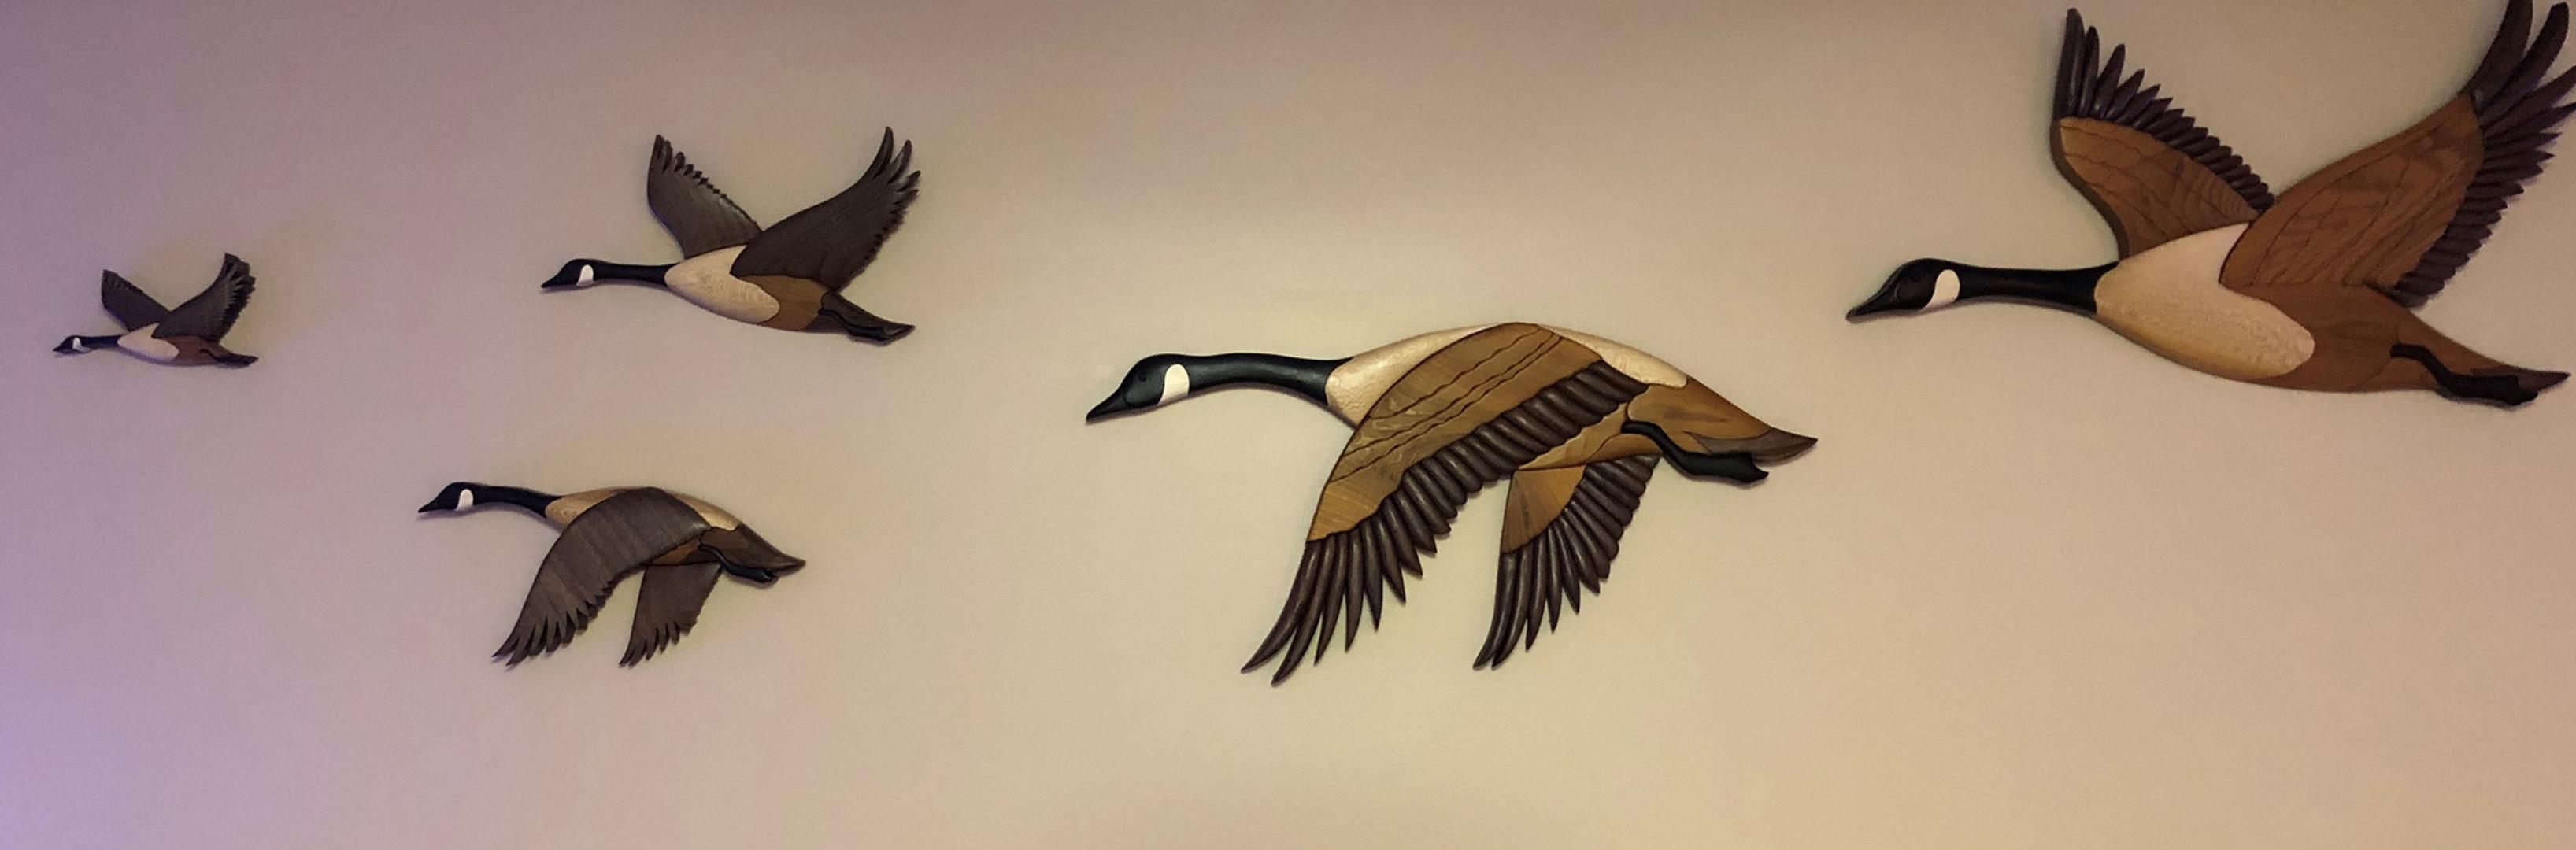 5 Intarsia Canadian Geese   $625.